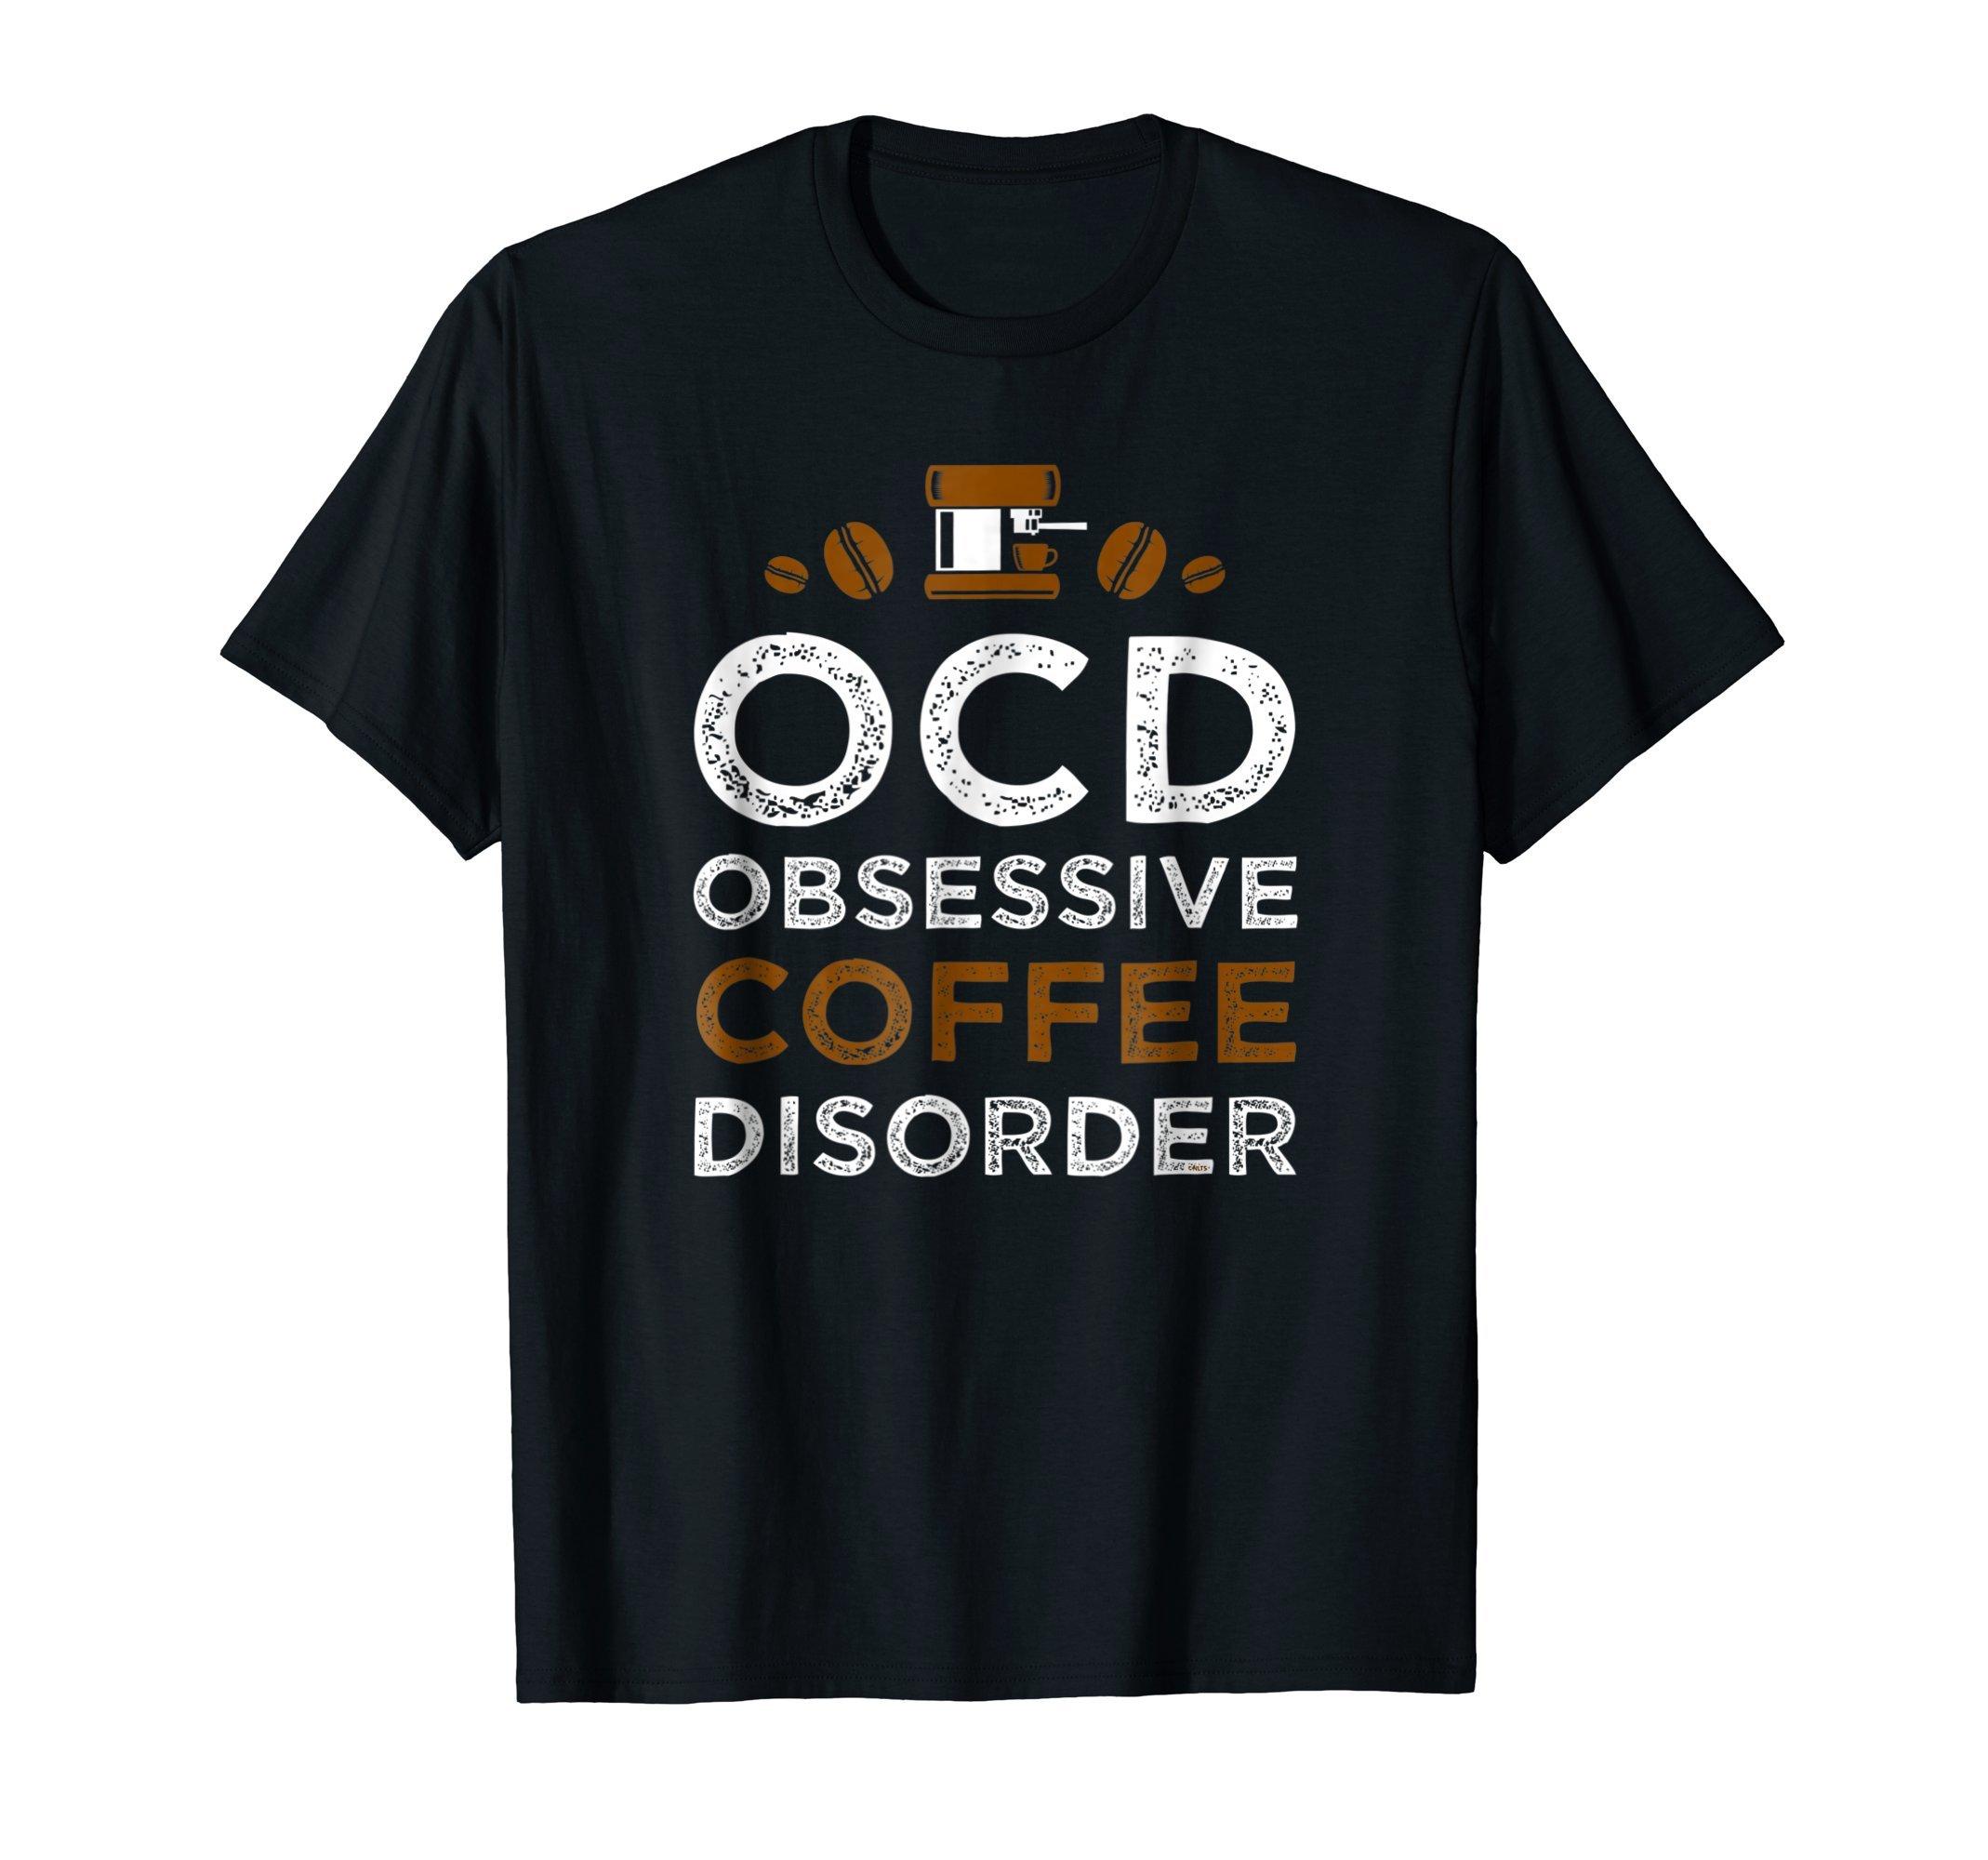 OCD-Obsessive-Coffee-Disorder-Funny-Humor-T-Shirt-Tee-Gift